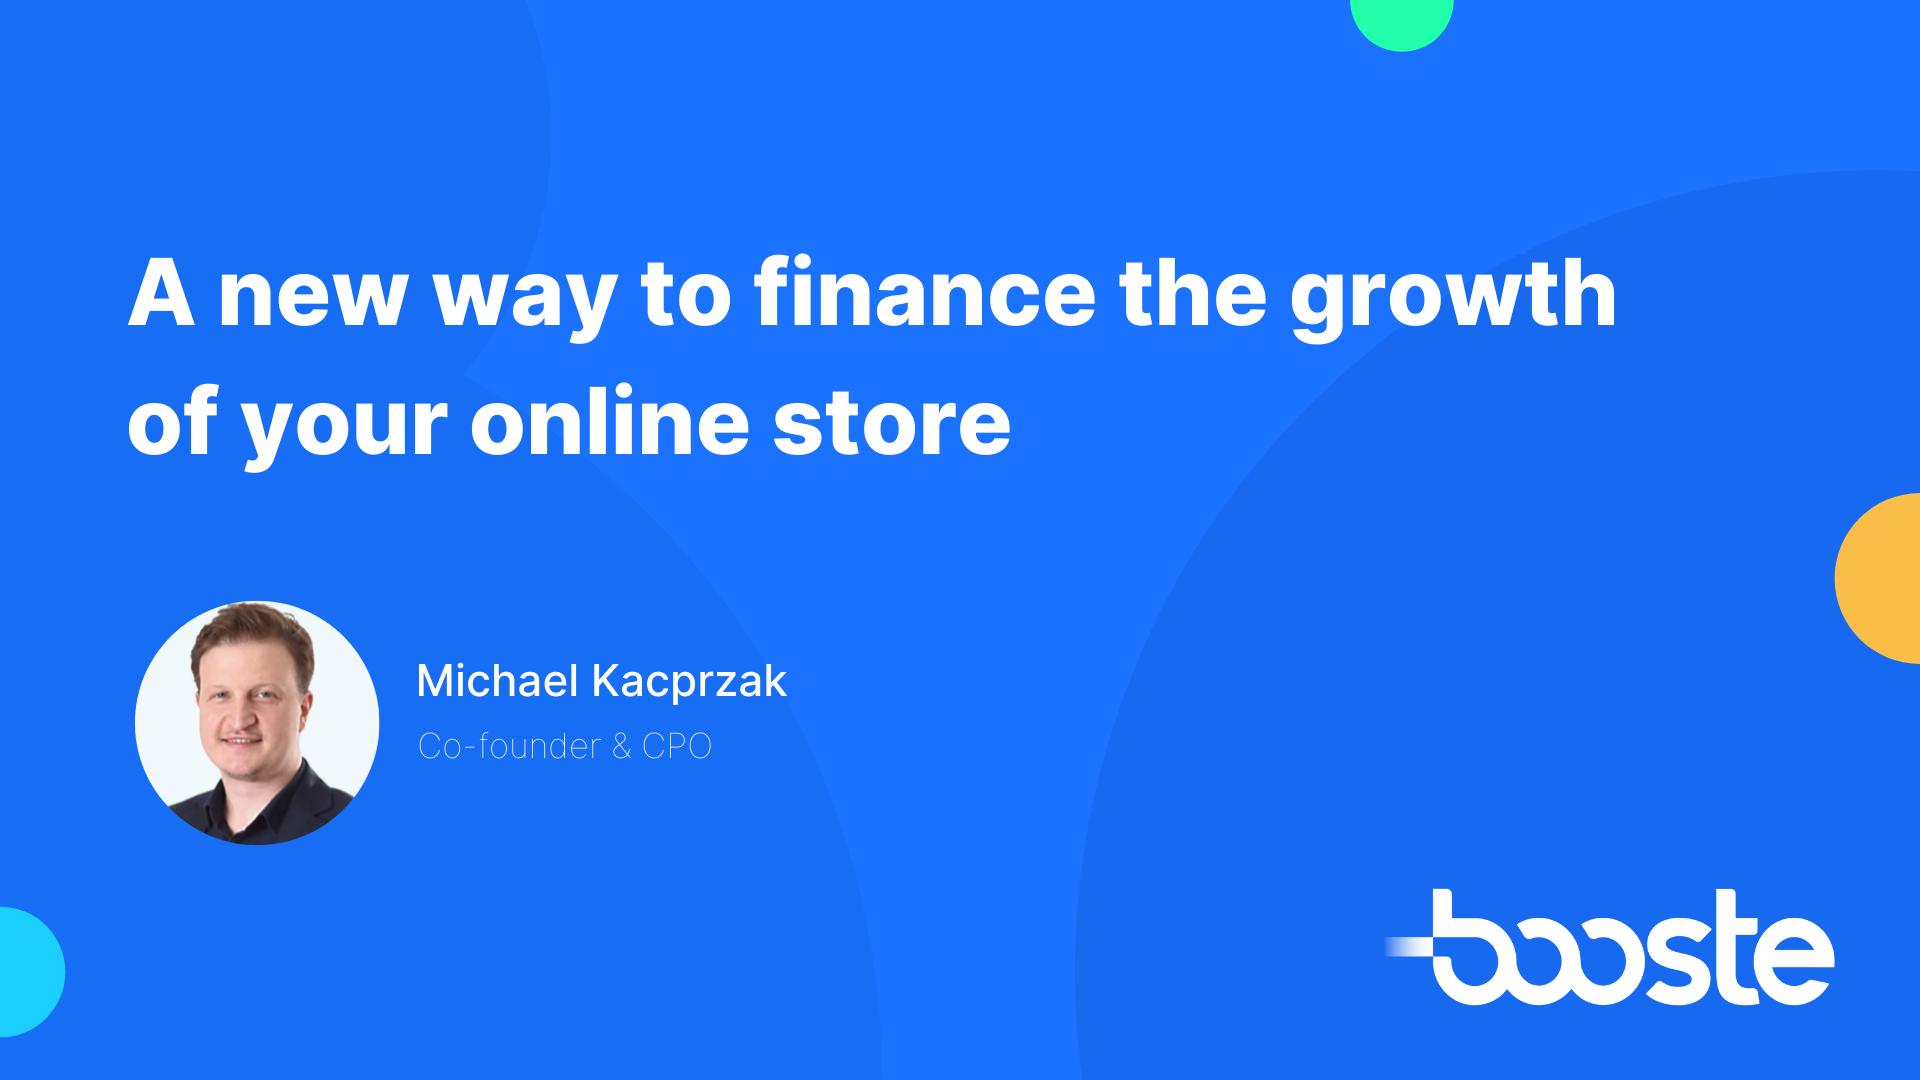 new way to finance growth